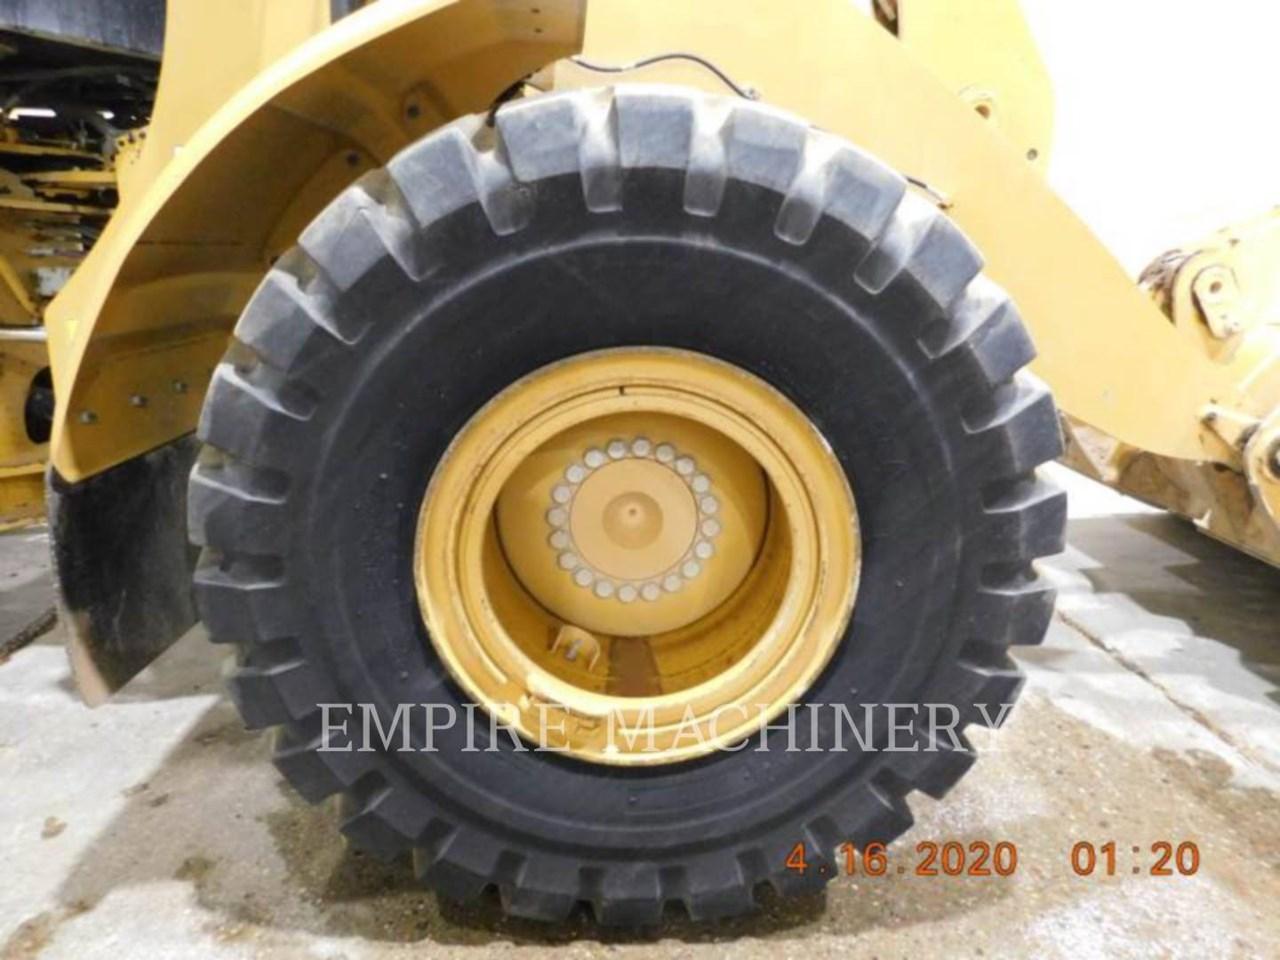 2015 Caterpillar 950M Image 5